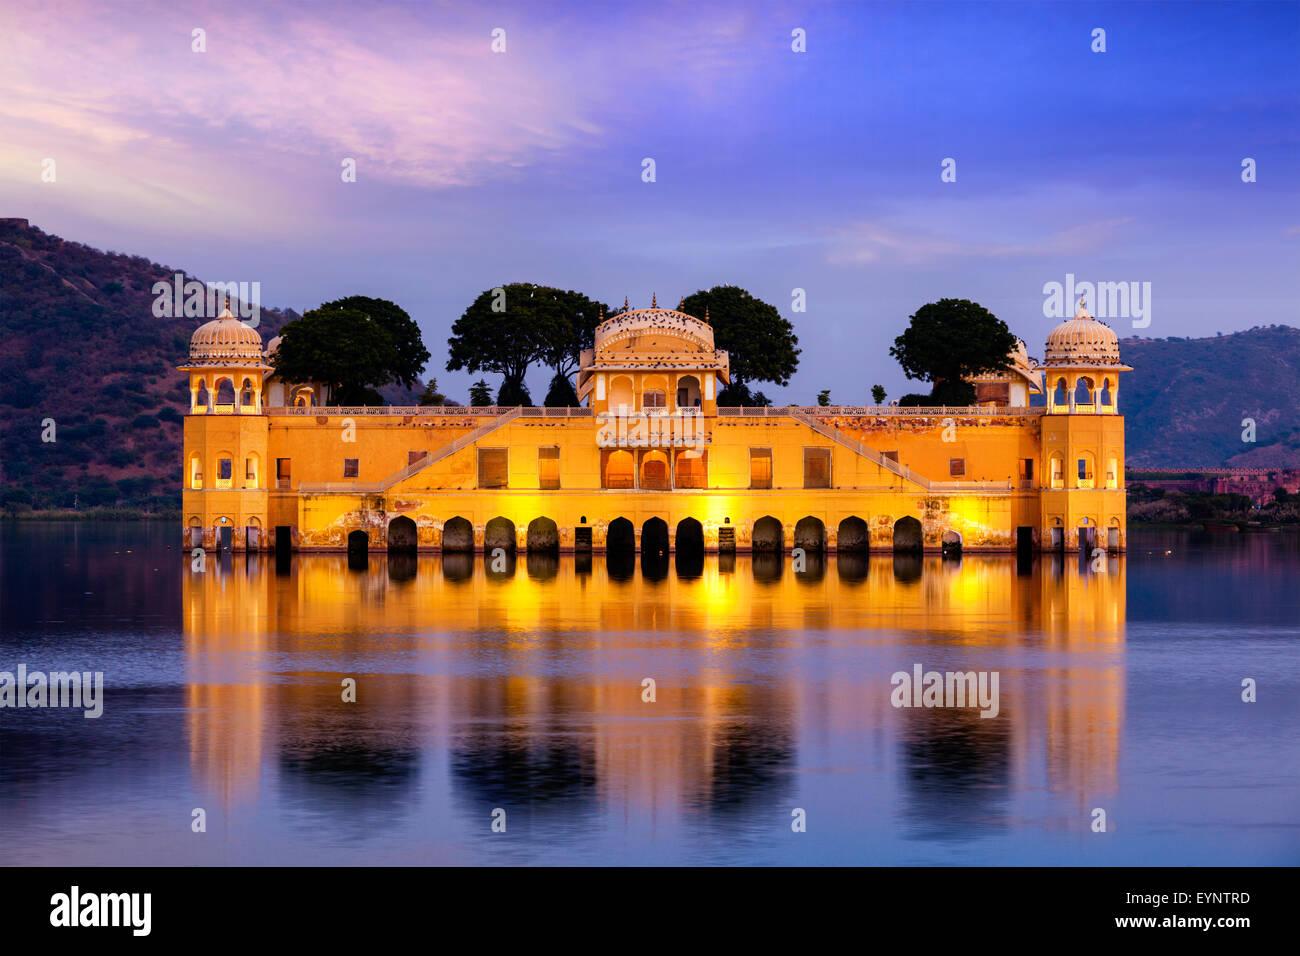 Jal Mahal Palazzo d'acqua. Jaipur, Rajasthan, India Immagini Stock